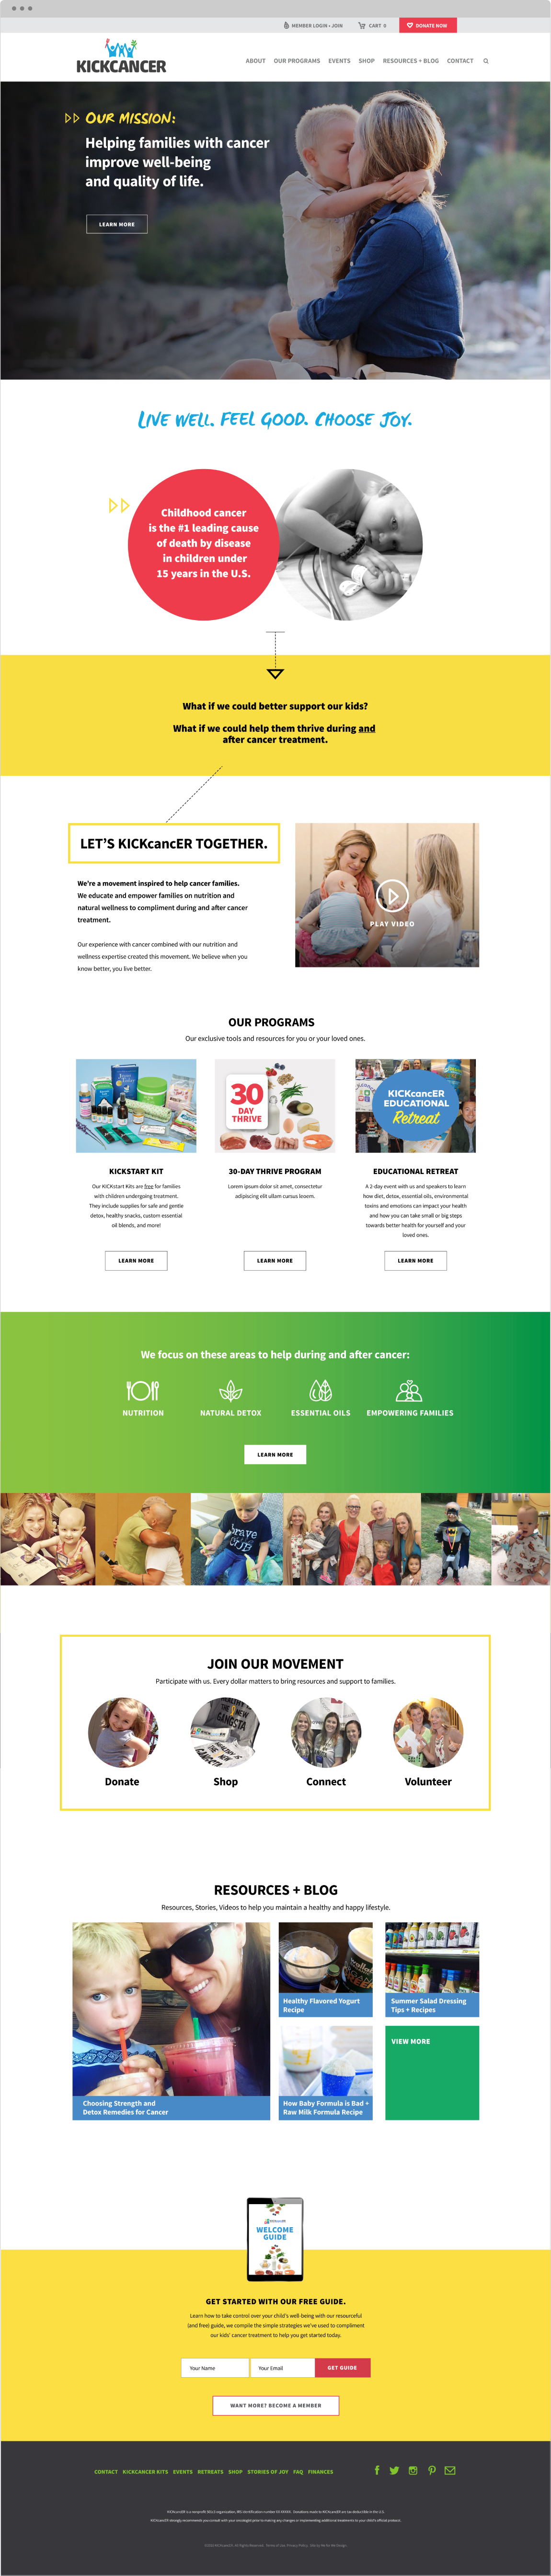 Kickcancer - New Site